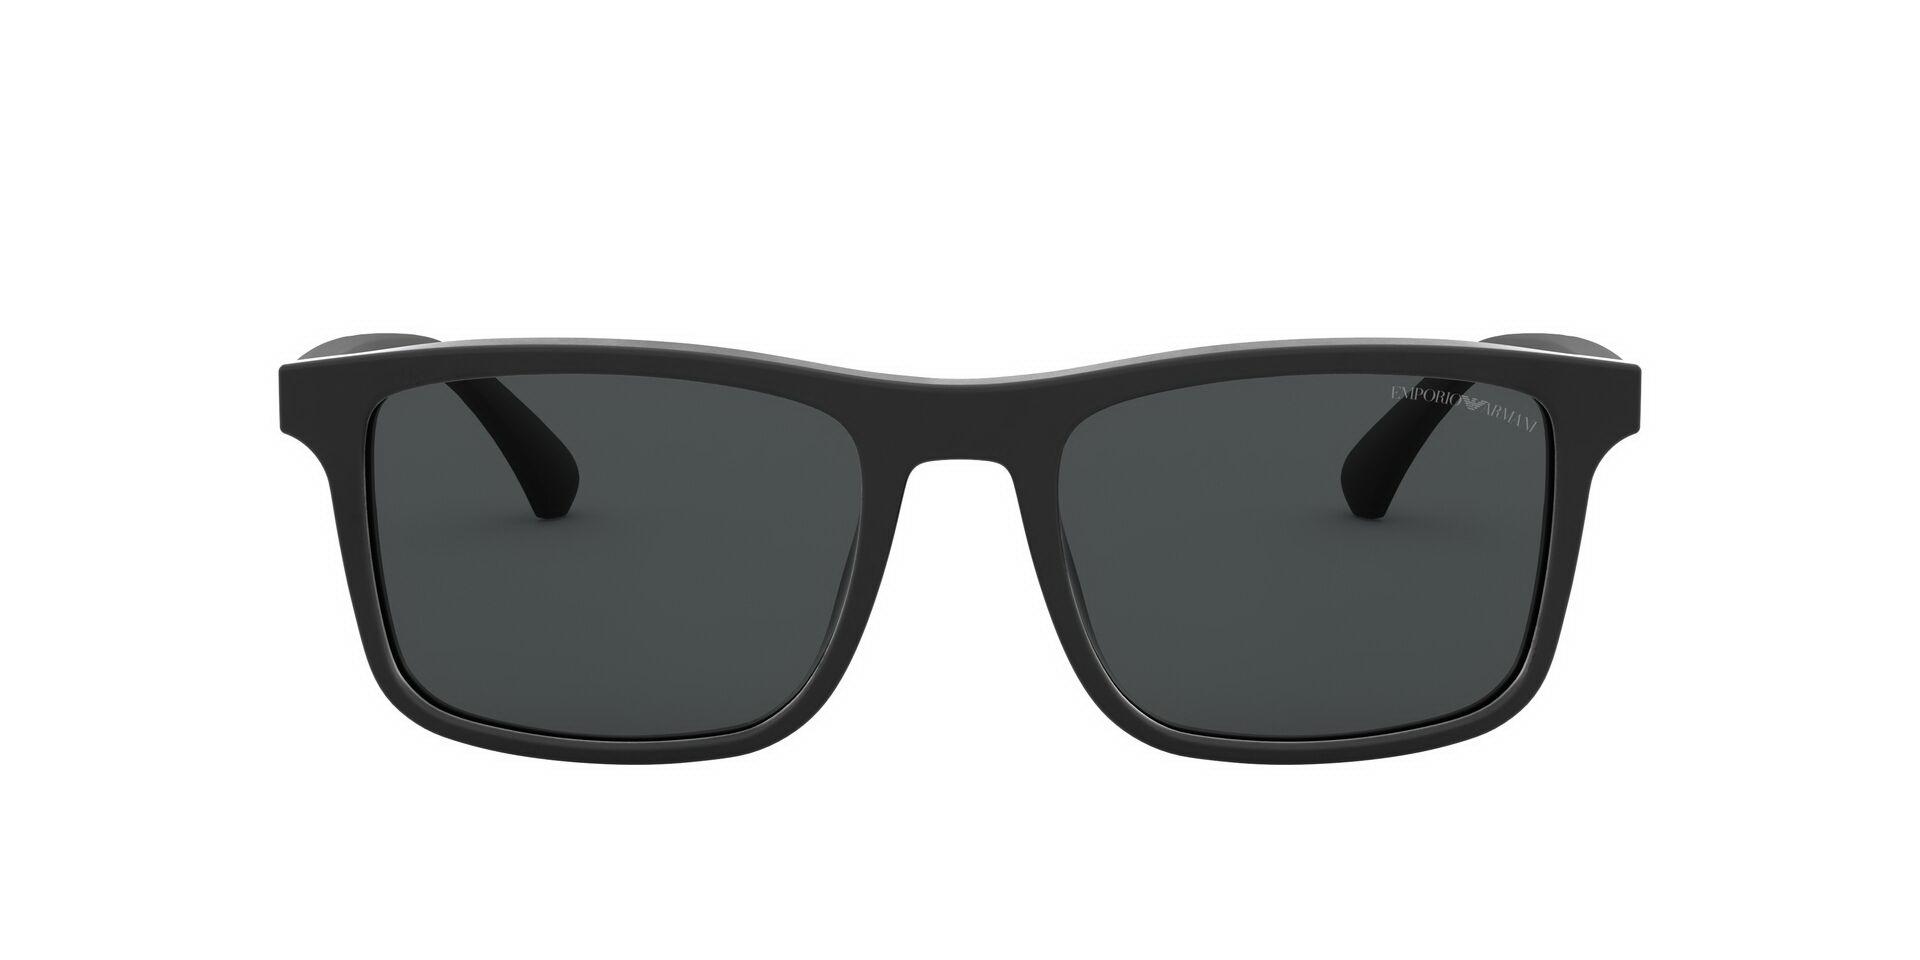 Солнцезащитные очки Очки с/з Emporio Armani 0EA4137 504287